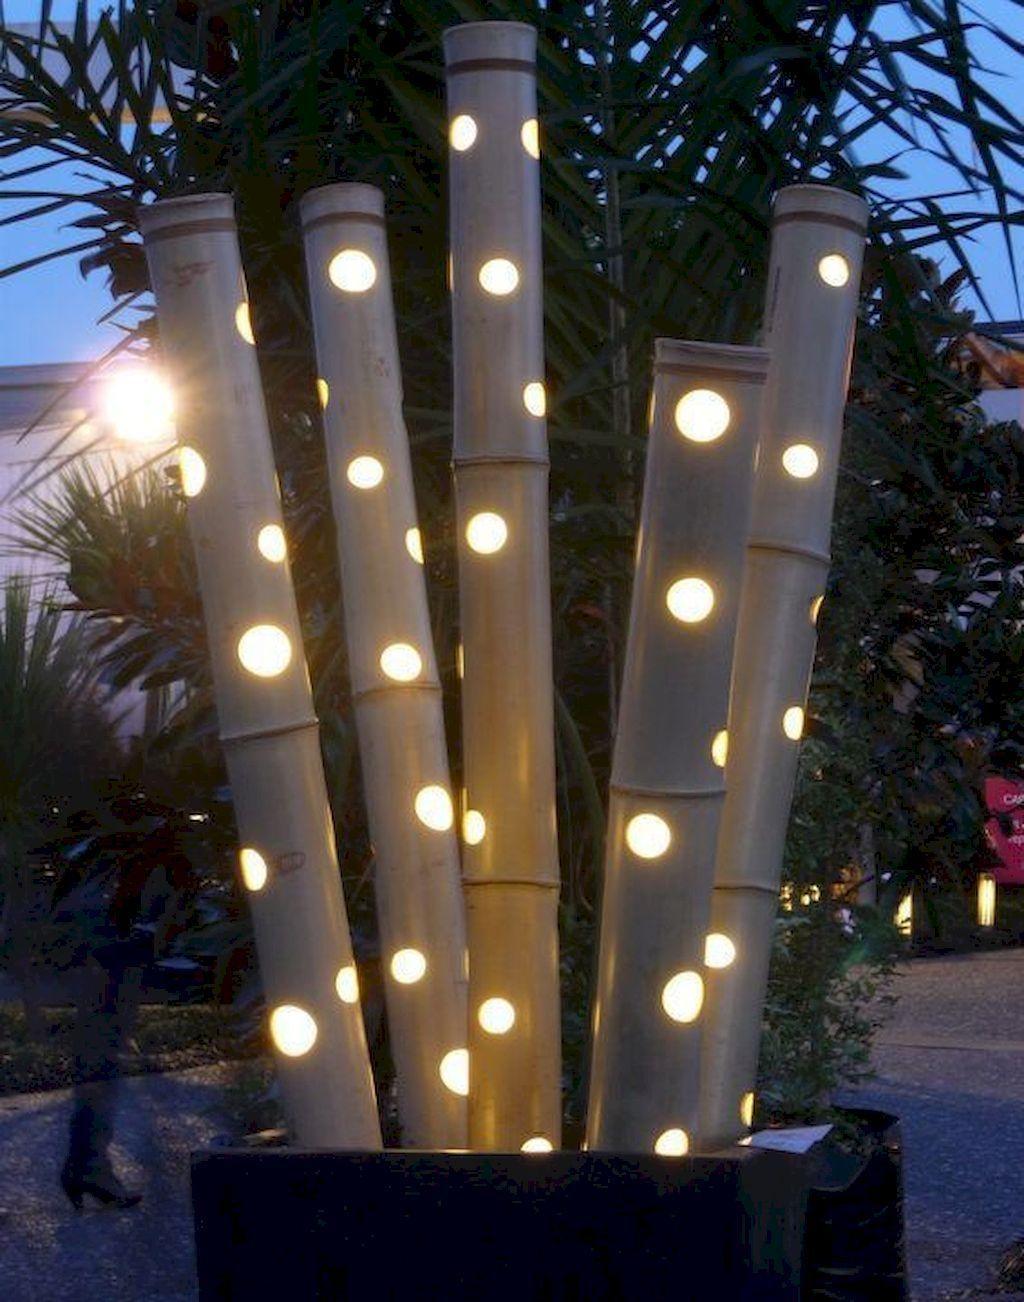 Nice 20+ Beautiful Light Design Ideas For Garden. | Garden Lighting Design, Diy Outdoor Lighting, Solar Lights Garden